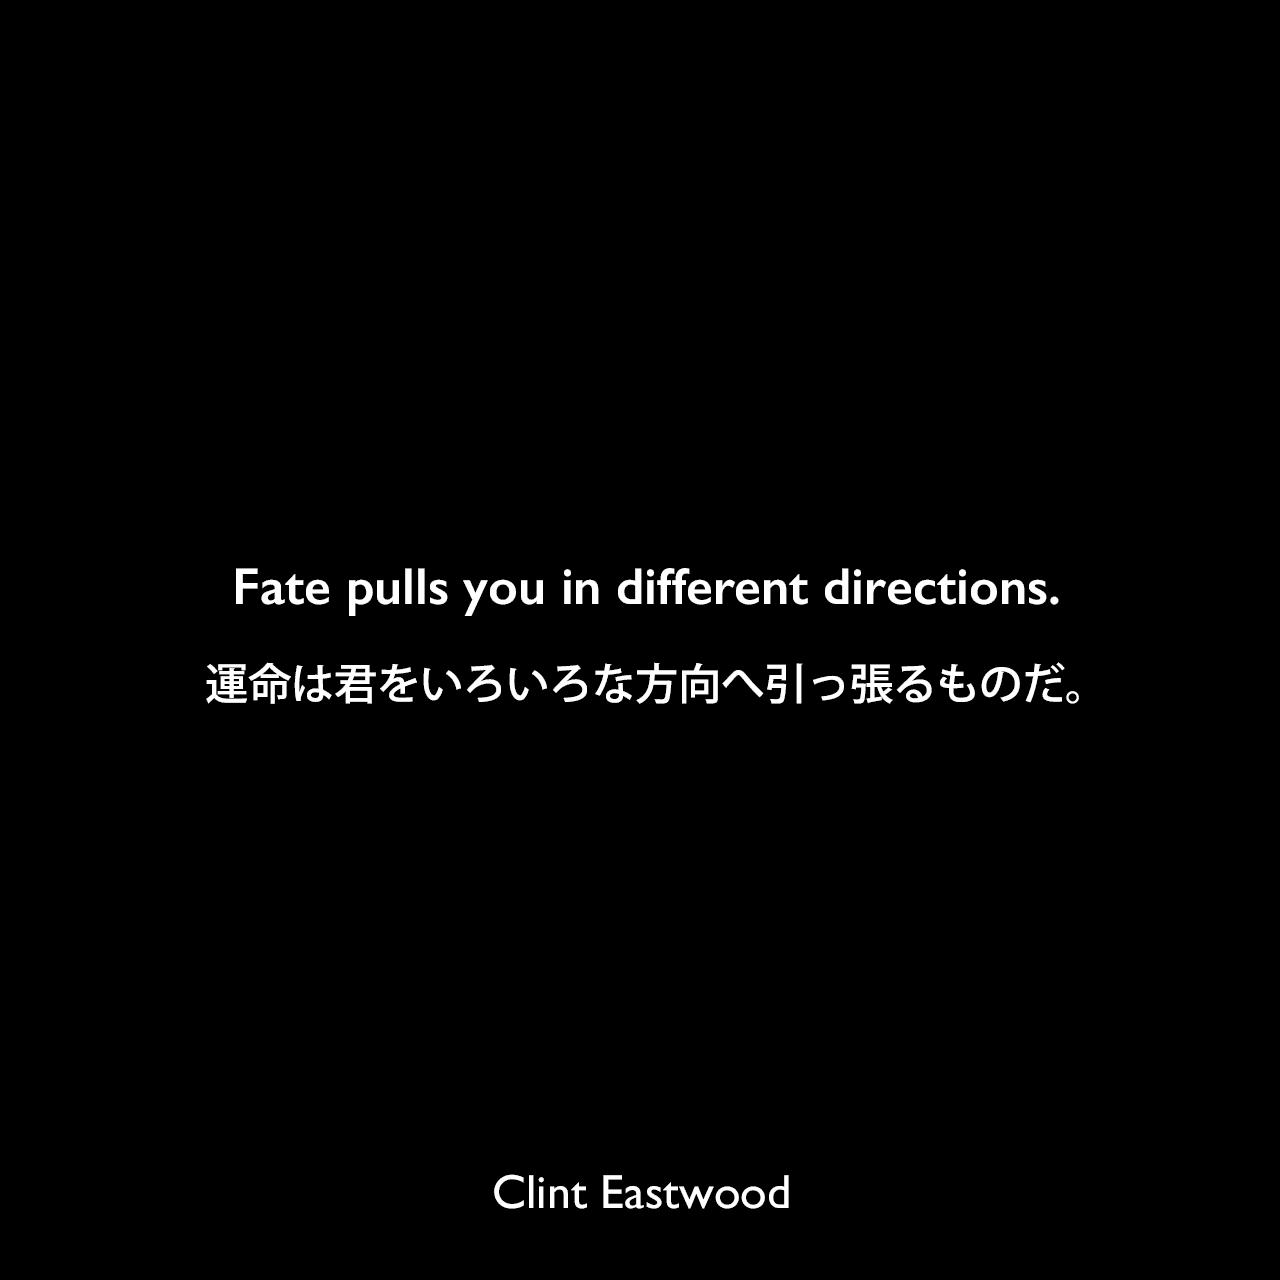 Fate pulls you in different directions.運命は君をいろいろな方向へ引っ張るものだ。Clint Eastwood